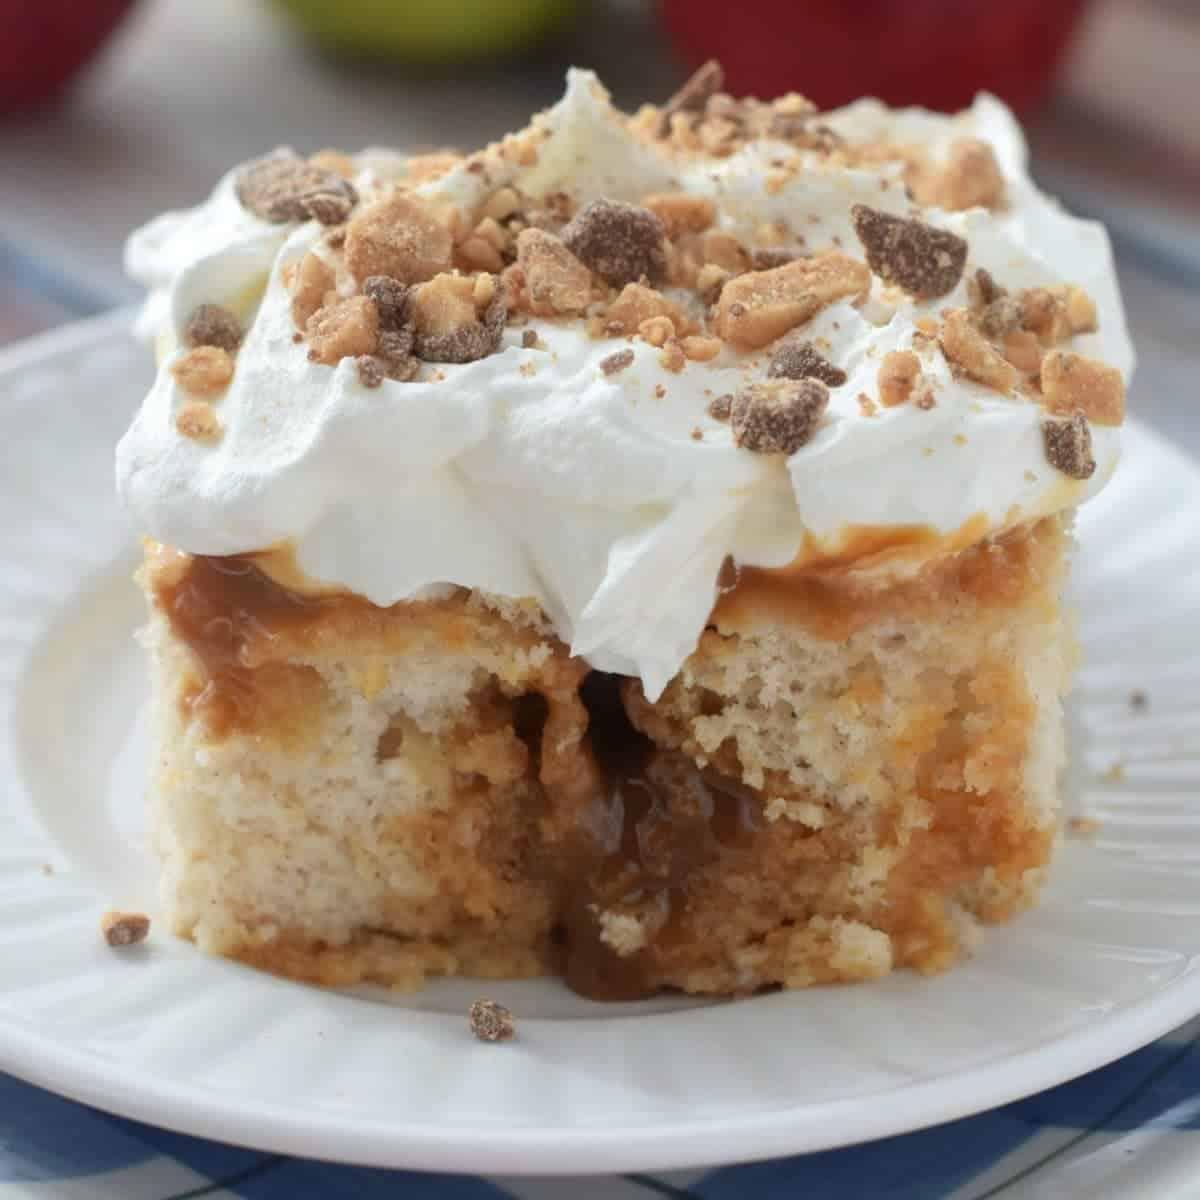 How Do You Make A Poke Cake